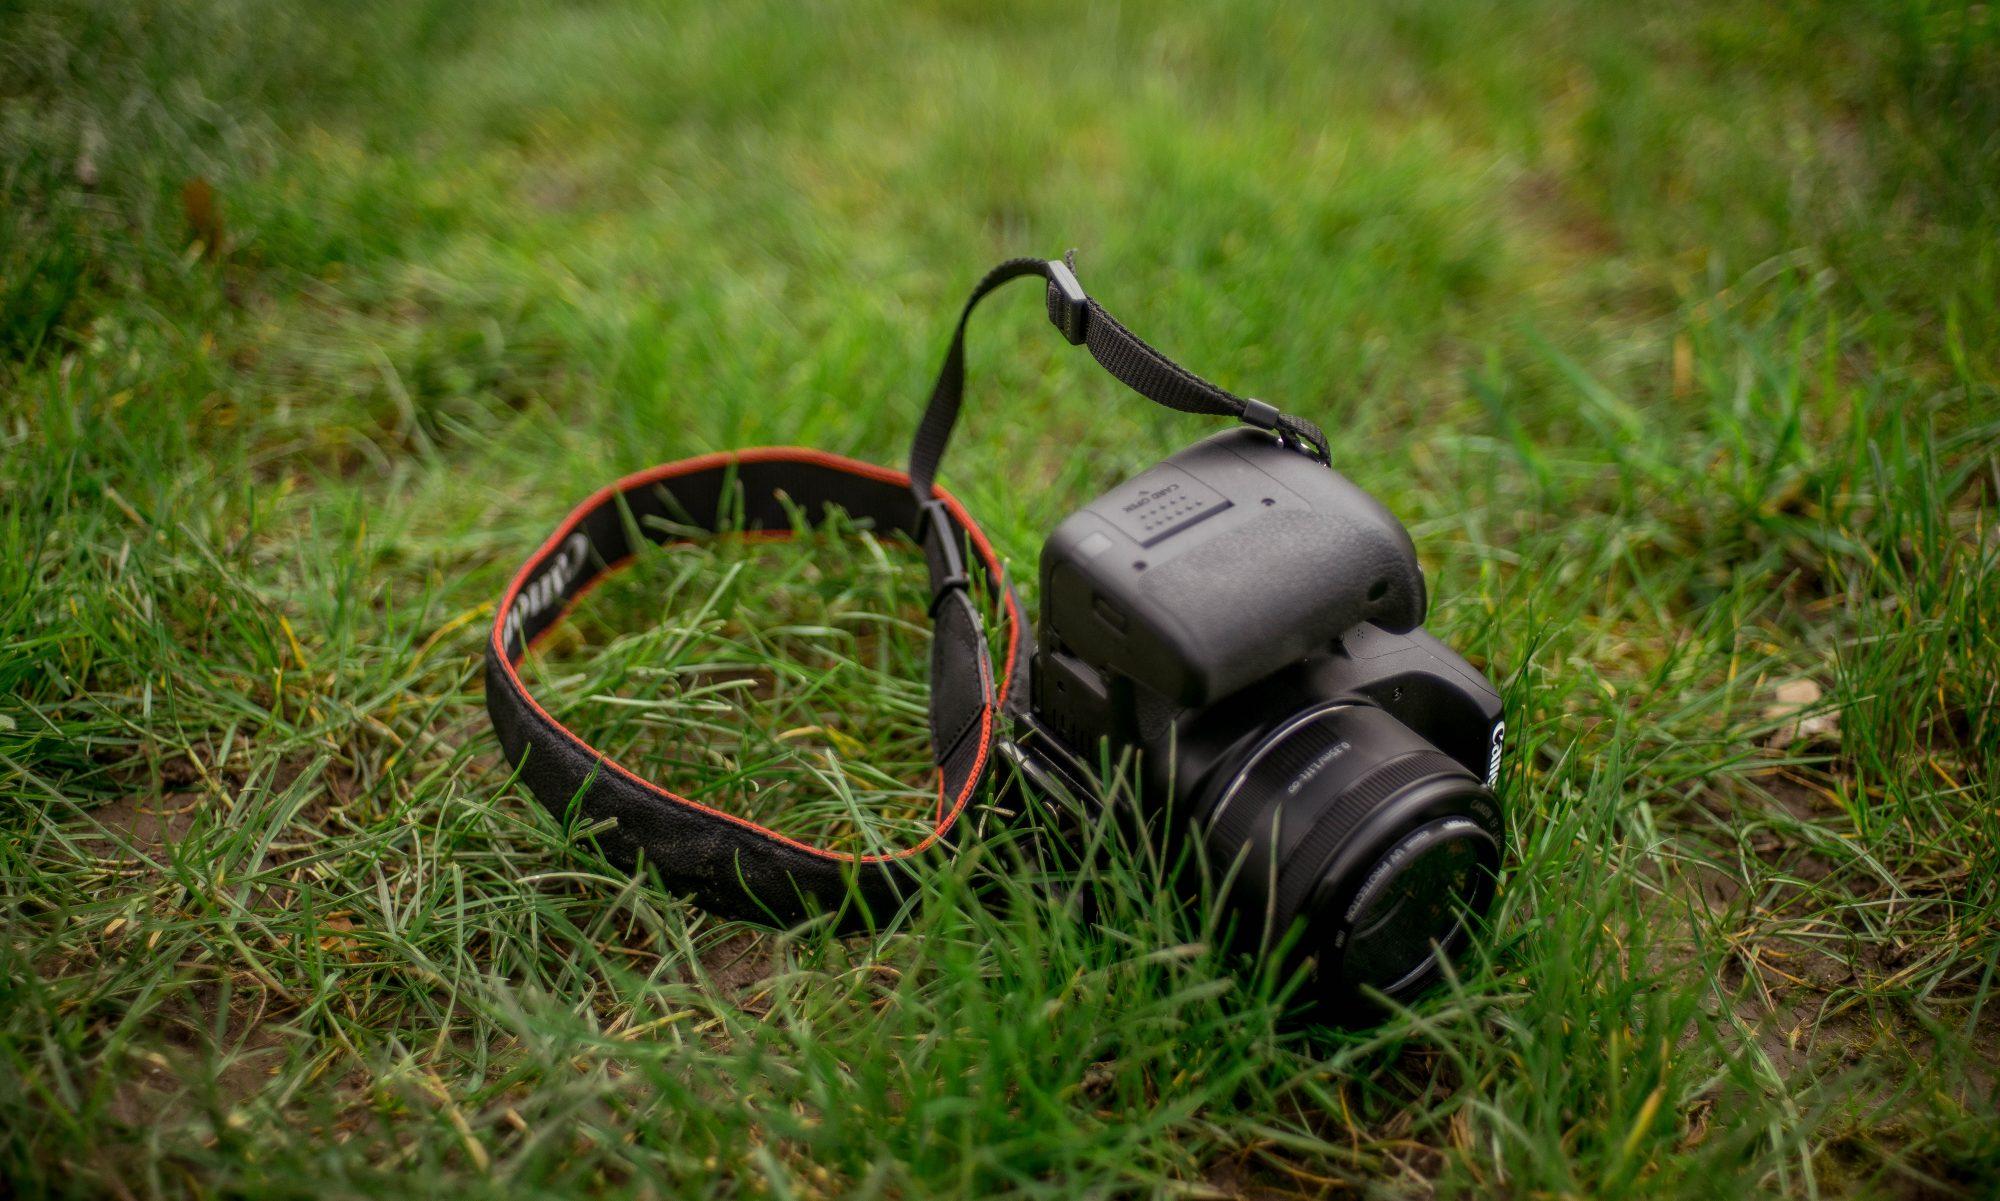 J. Sander Photography